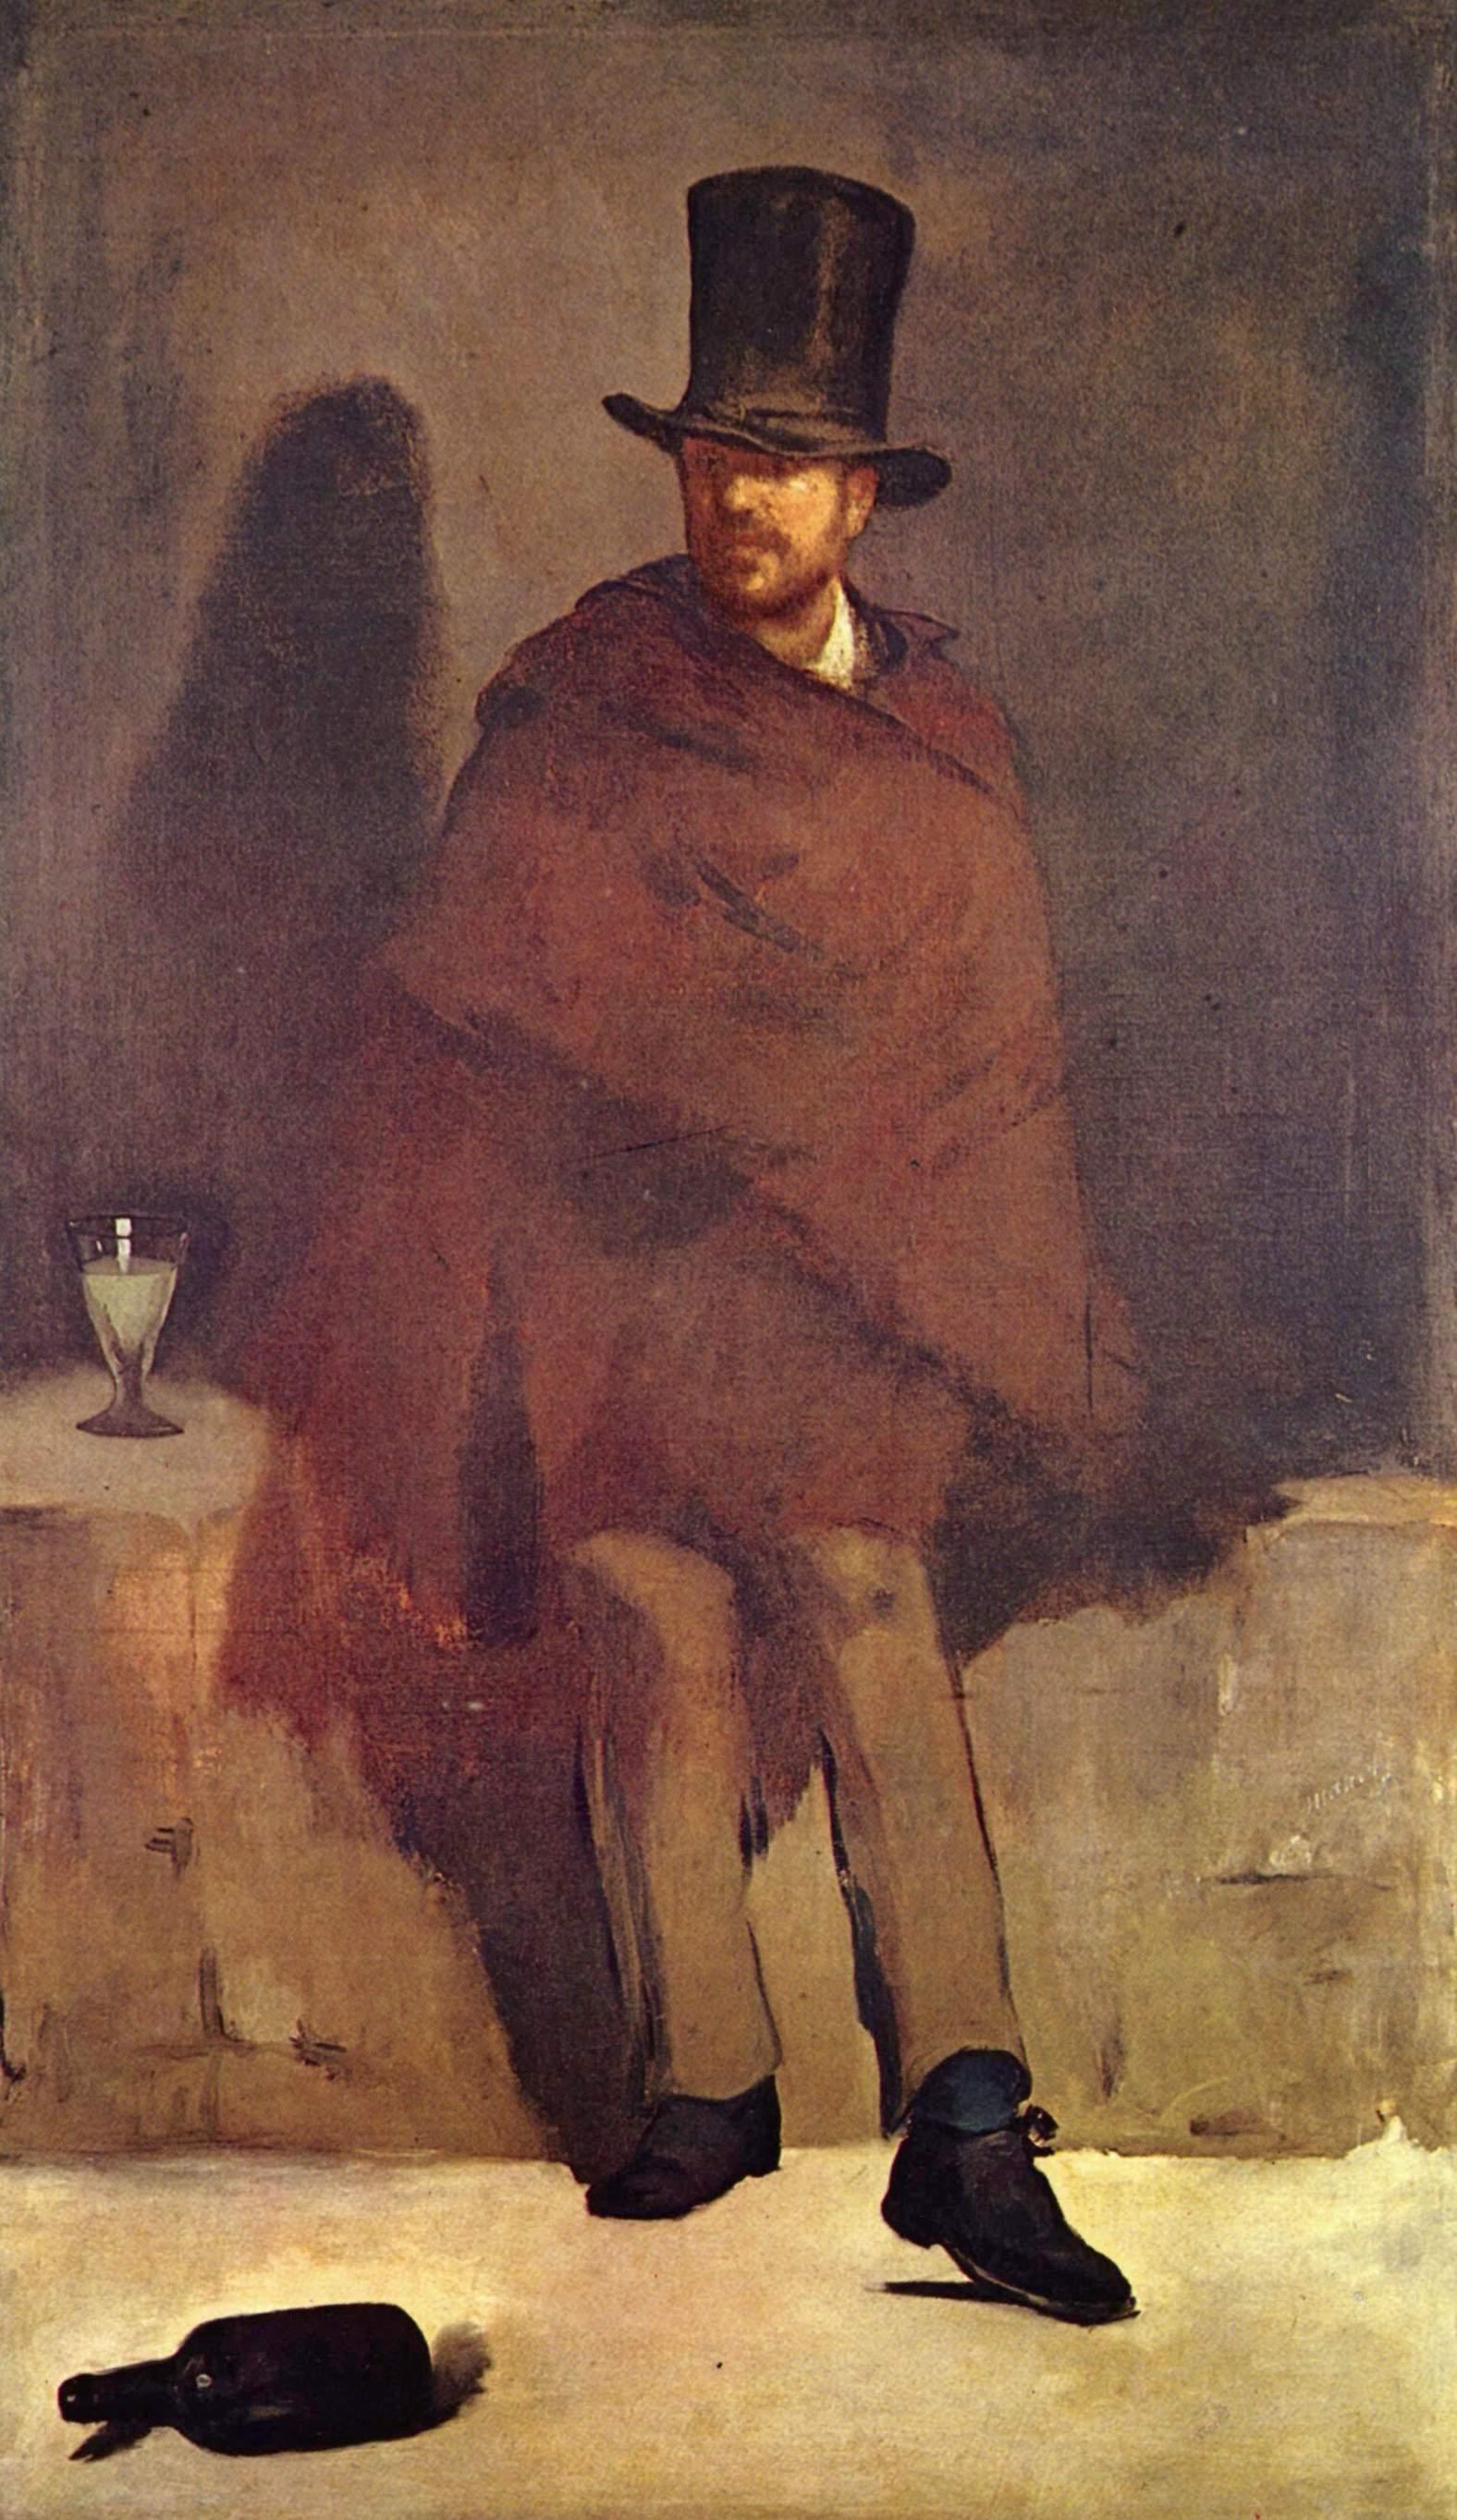 Edouard Manet, The Absinthe Drinker, 1859